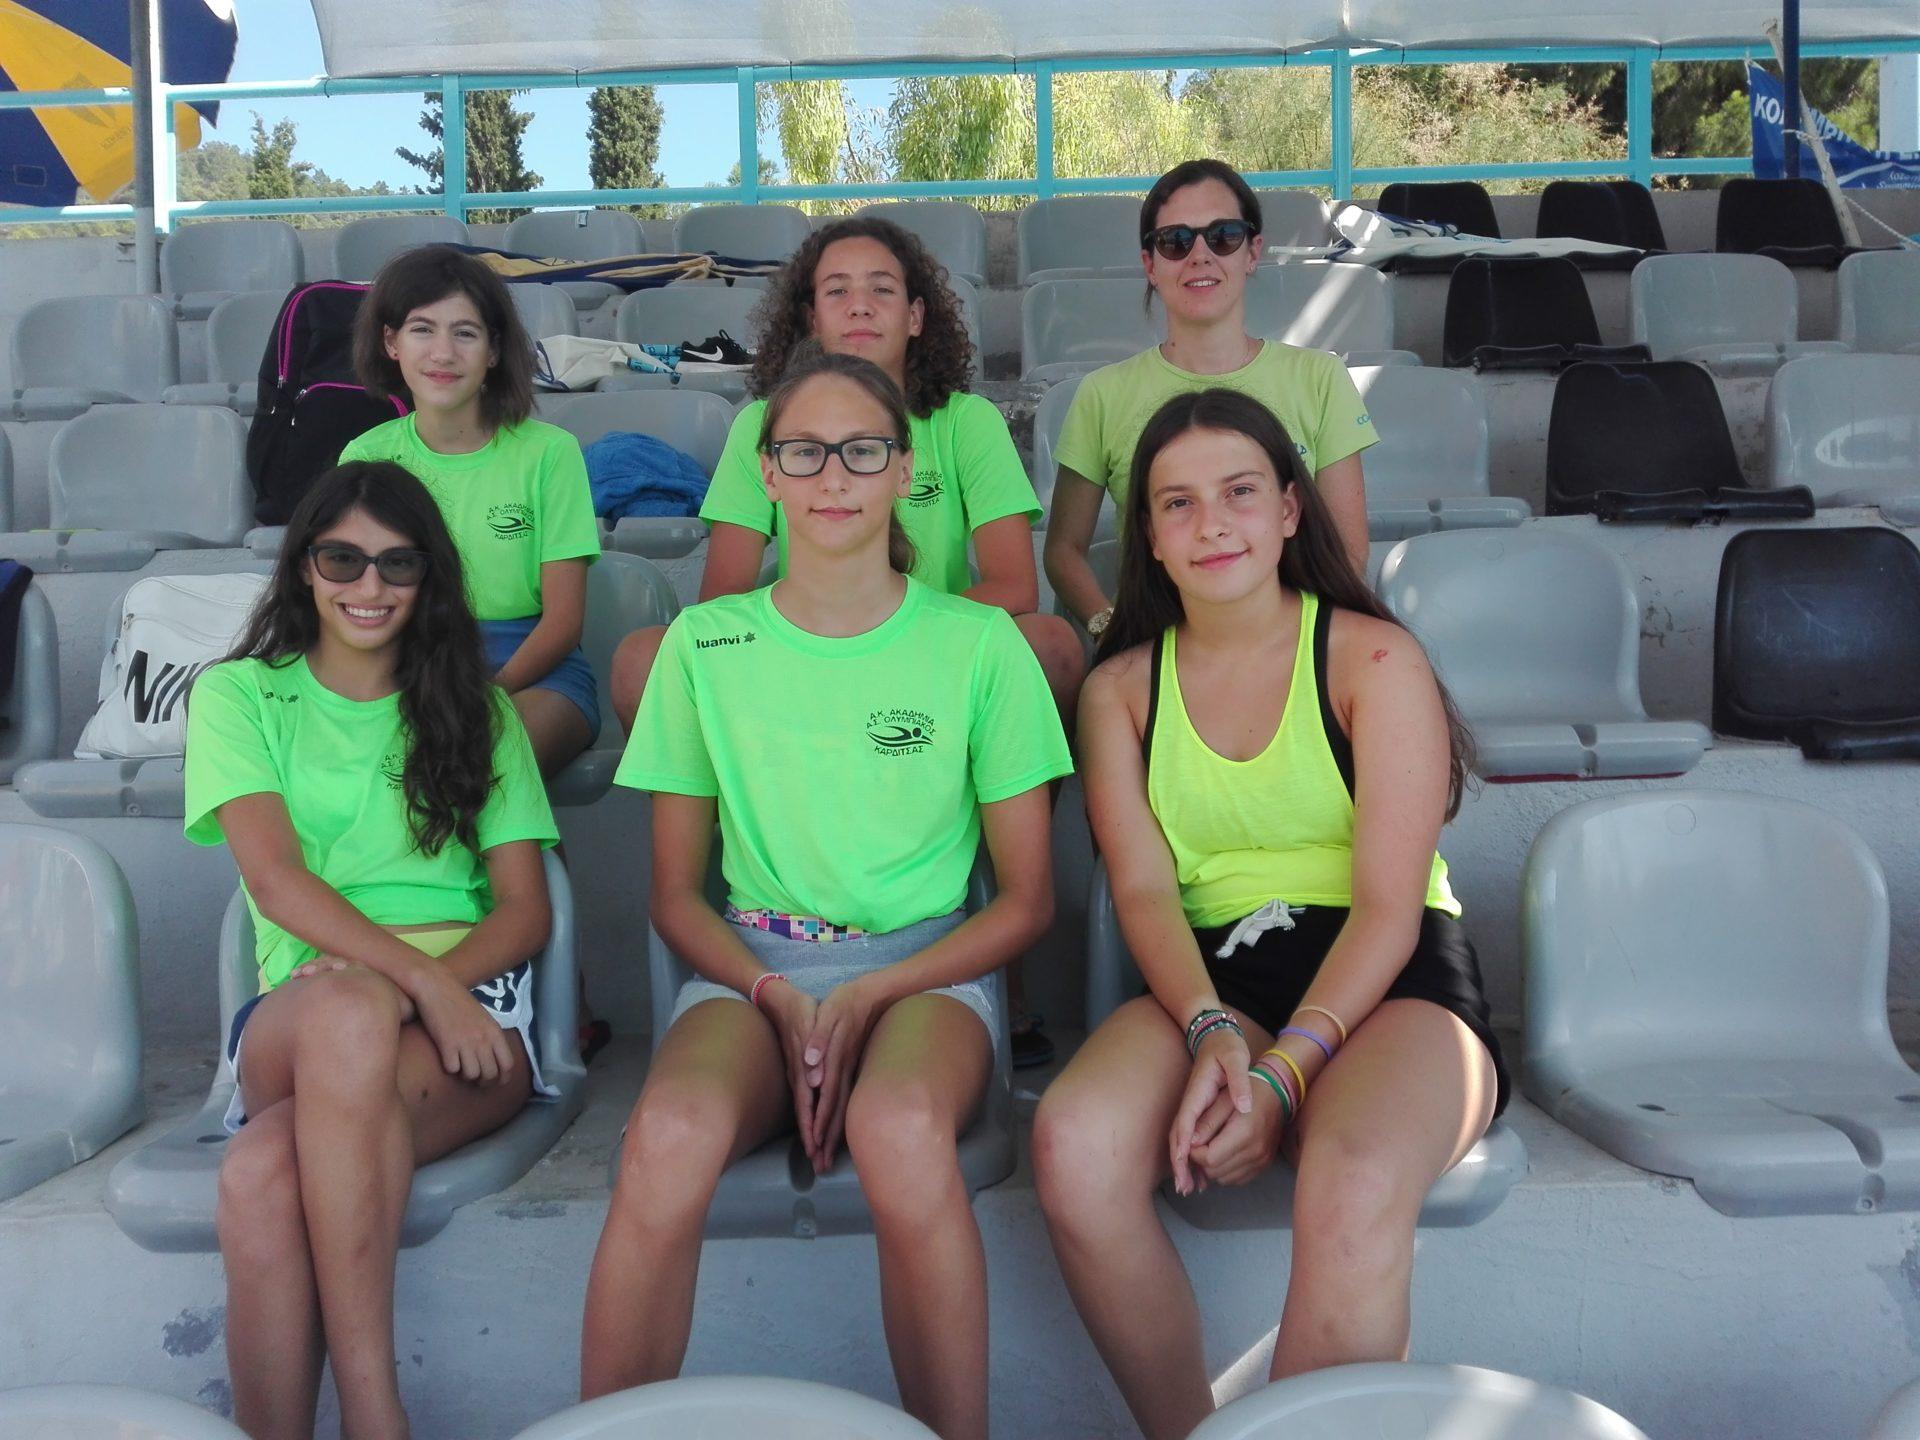 AKAK.GR – Εντυπωσιακή η νέα ομάδα της ΑΚΑΚ & του ΑΣΚ Ολυμπιακός στους αγώνες κολύμβησης «Αντώνης Δρόσος»